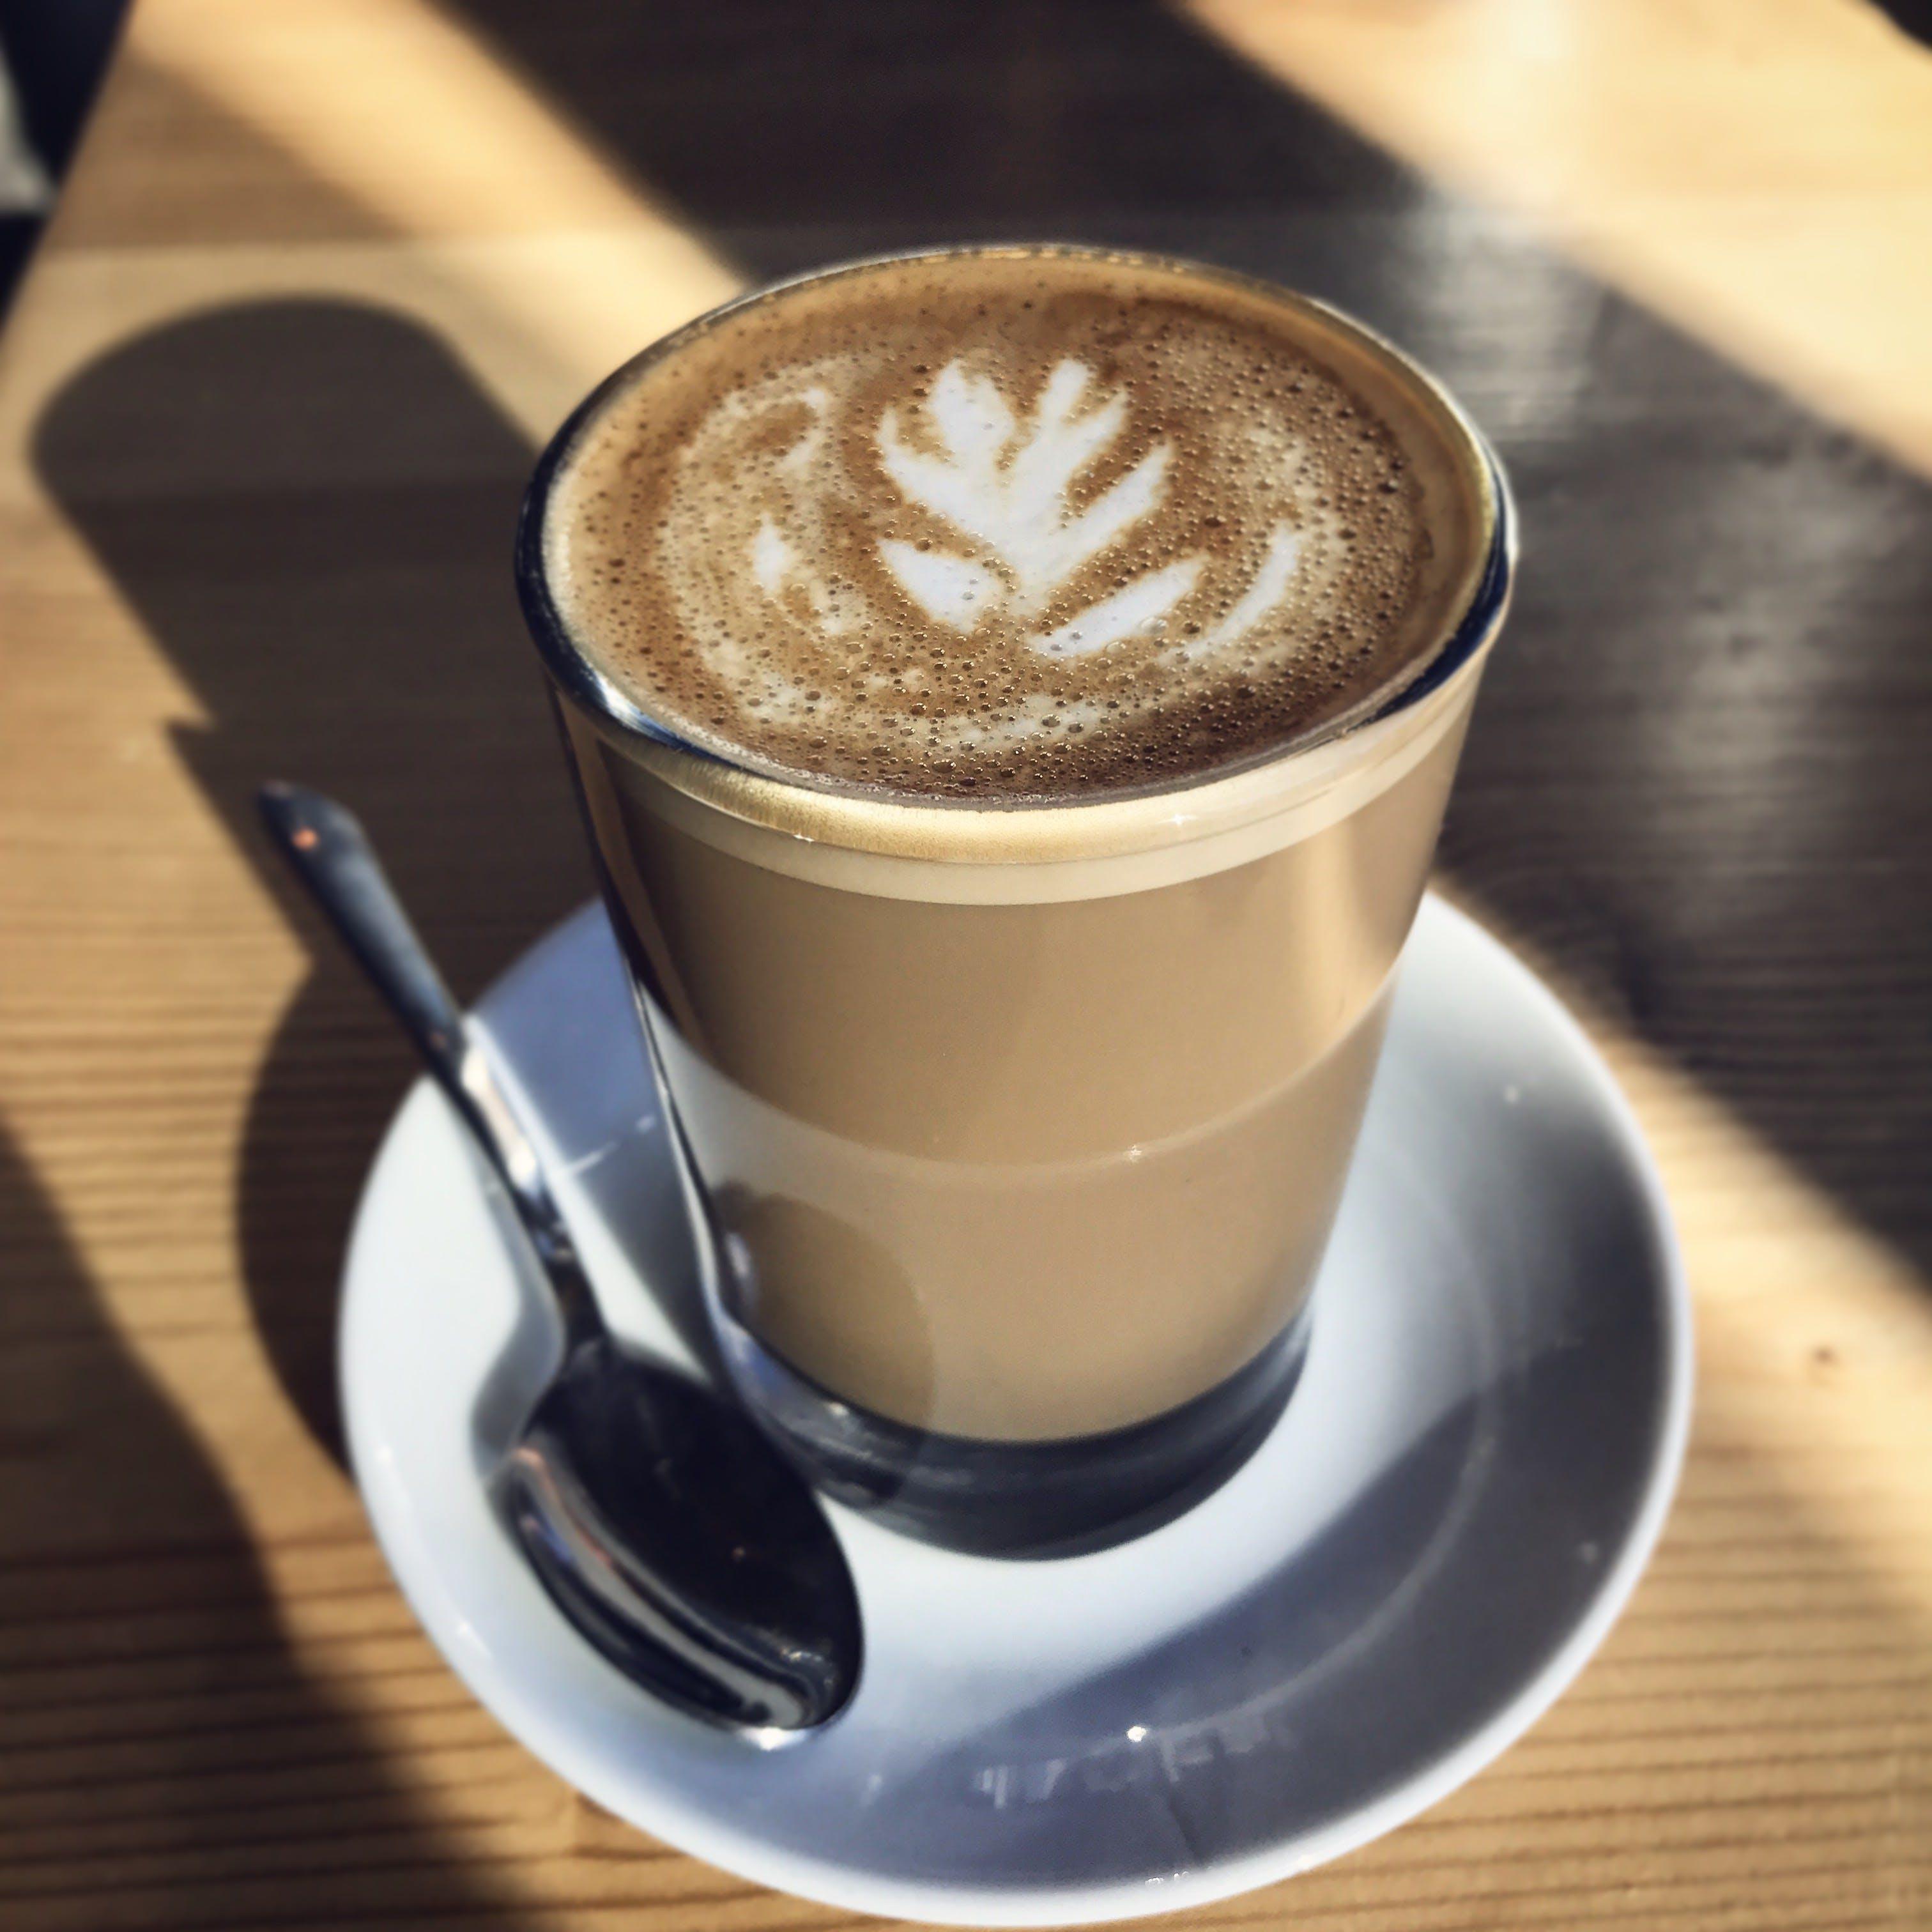 artistic, beverage, café